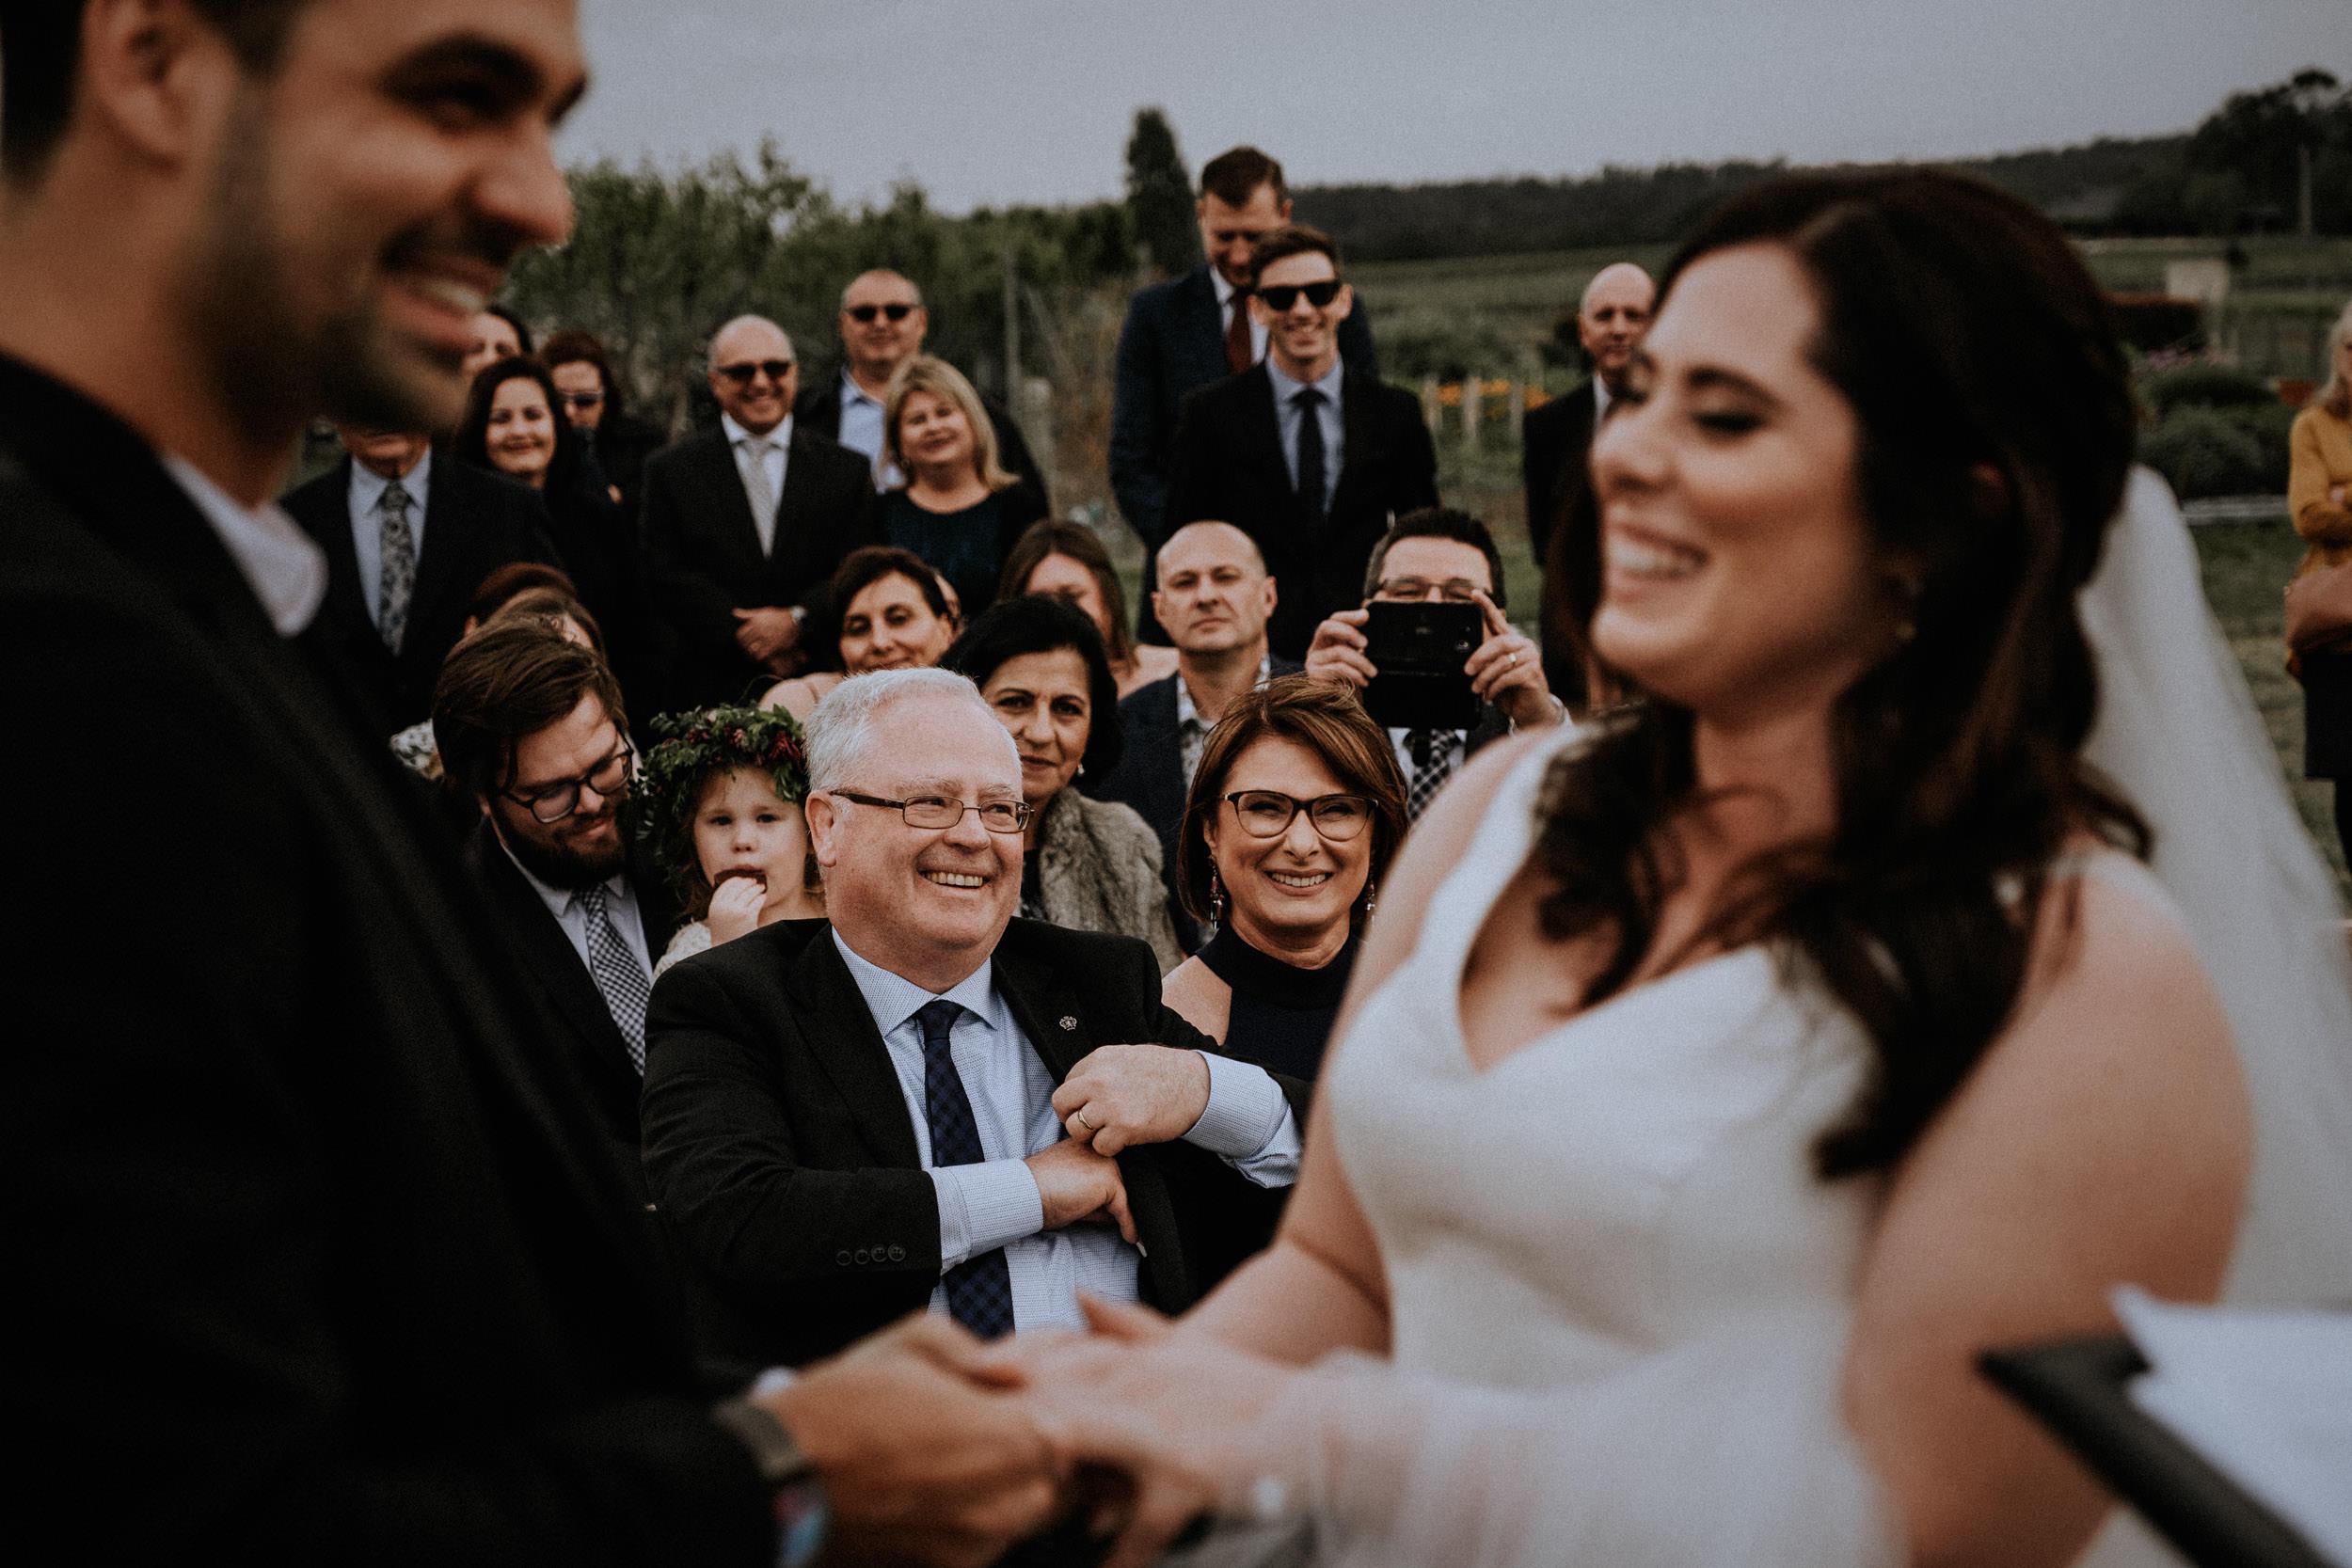 s+j_top_elopement wedding photography_kings & thieves_blog - 302.jpg